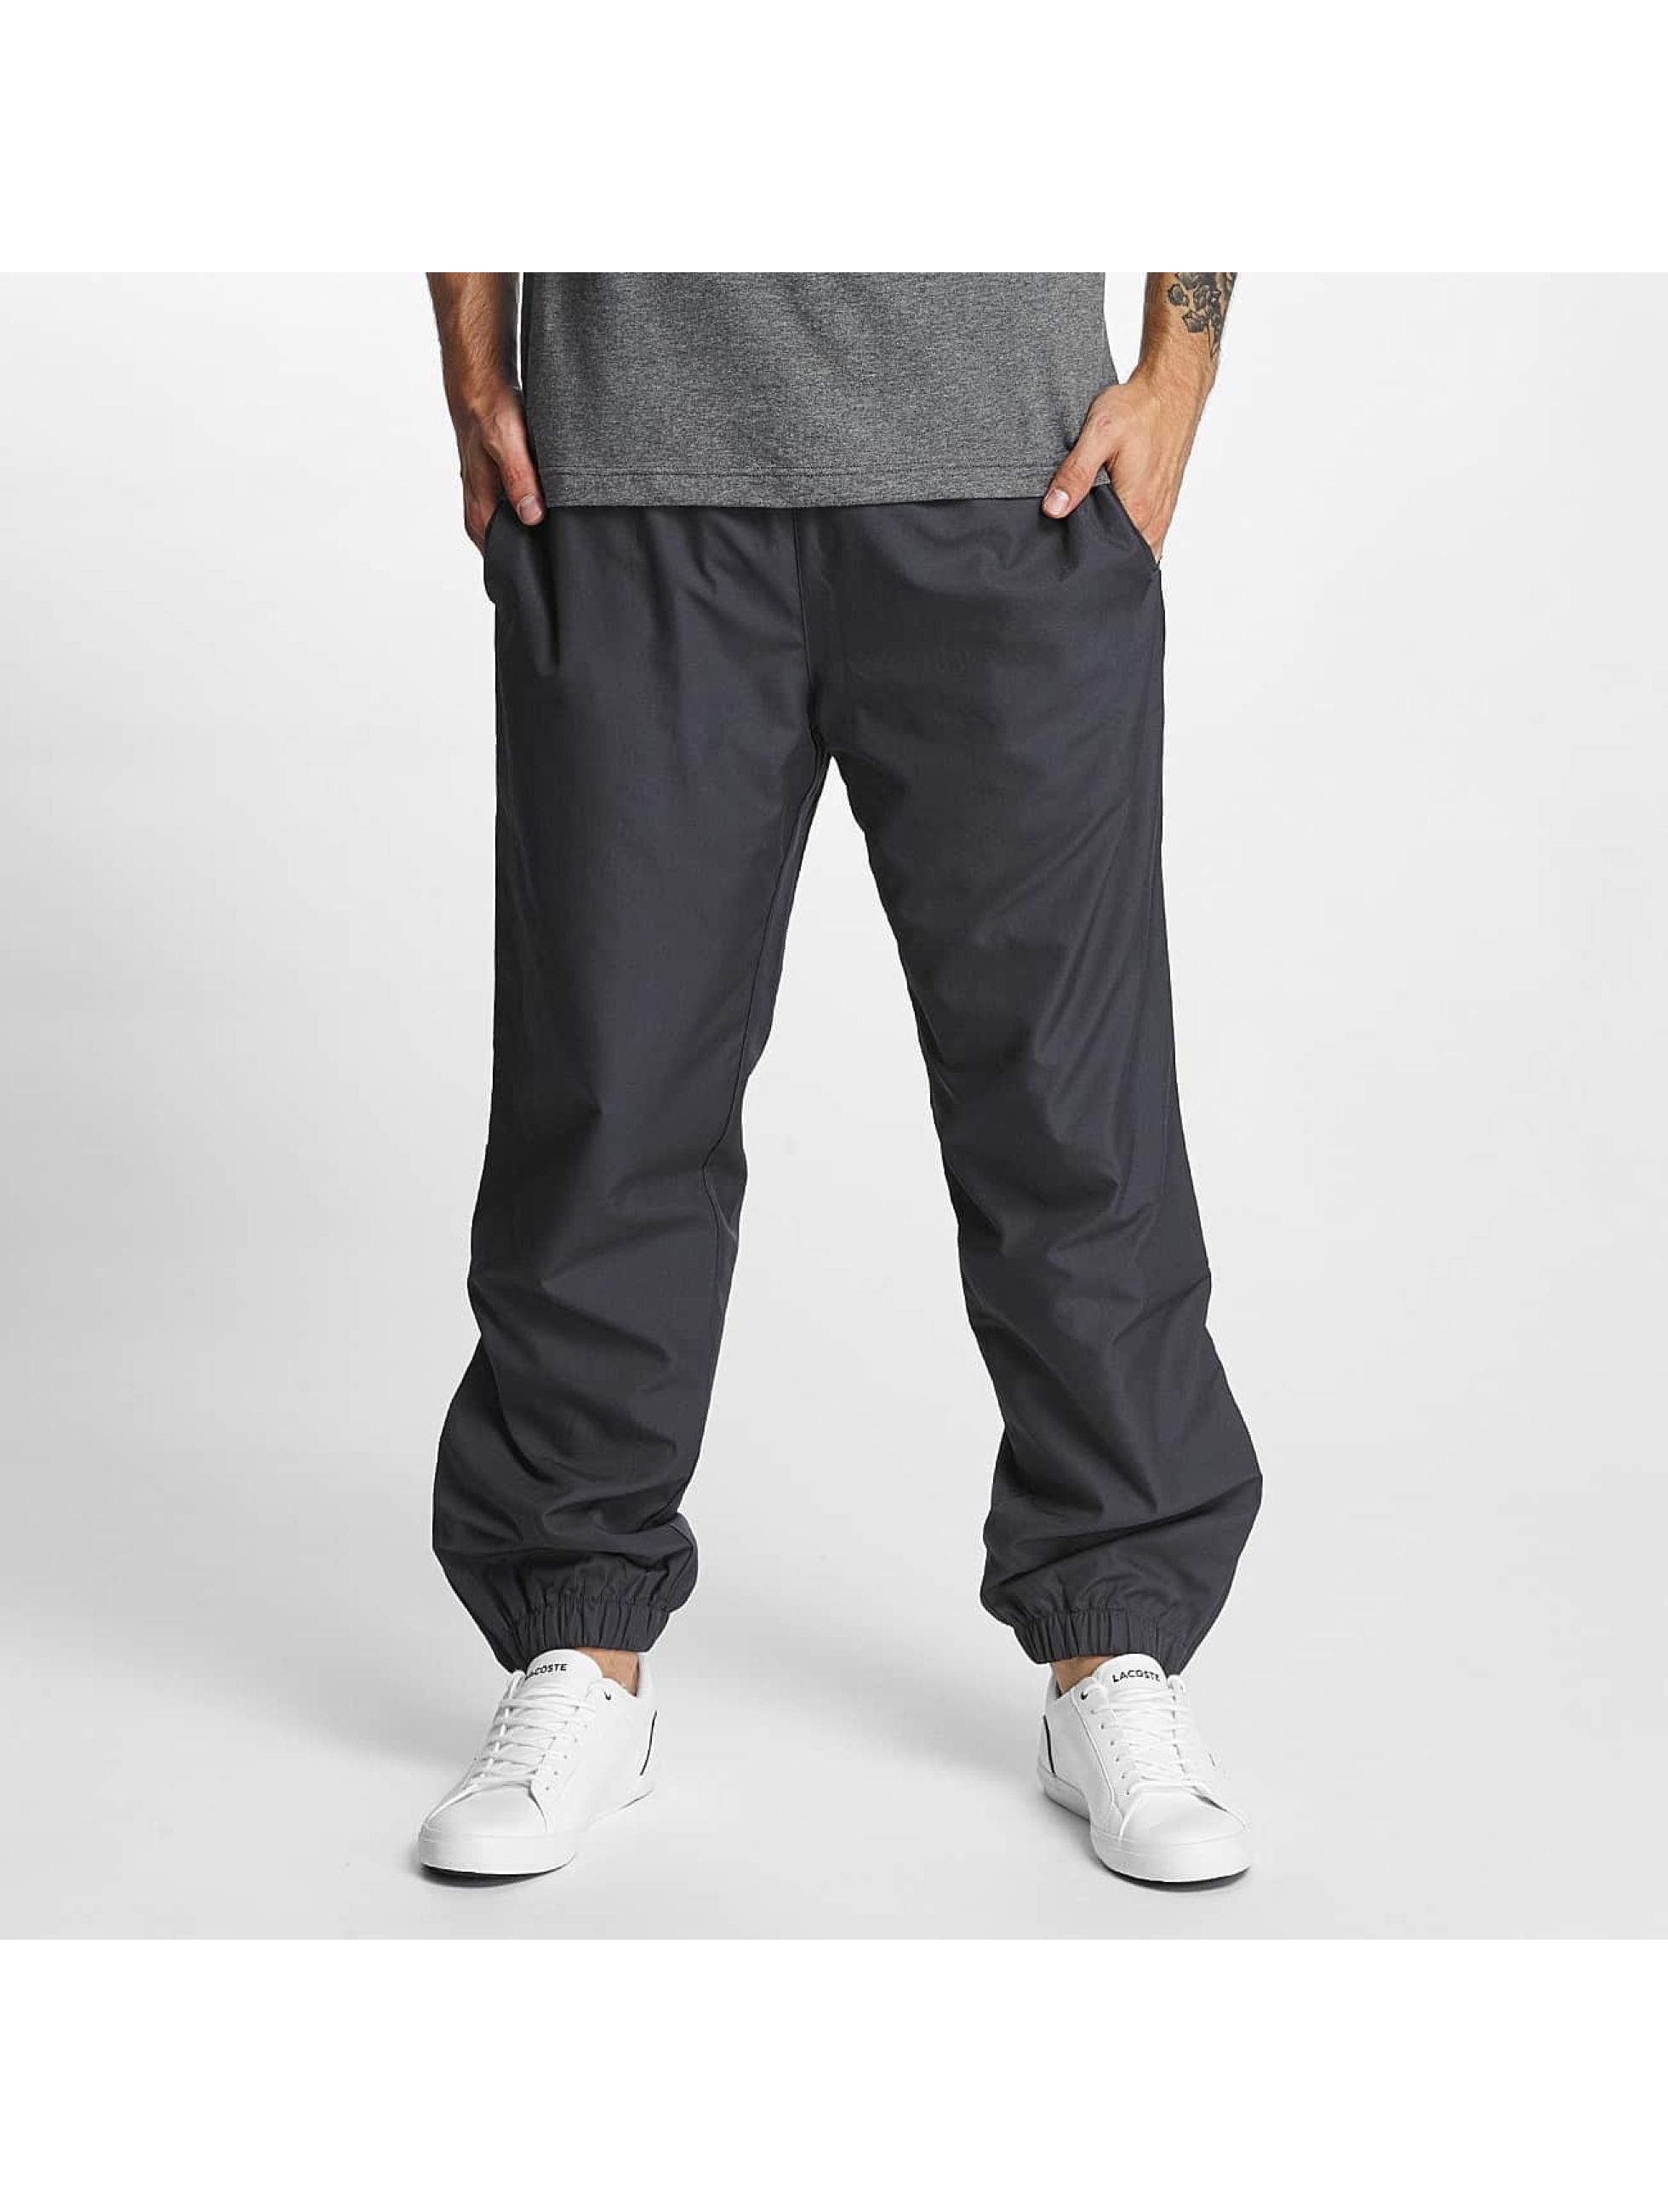 herren lacoste classic jogging pants graphite 03570677987487. Black Bedroom Furniture Sets. Home Design Ideas